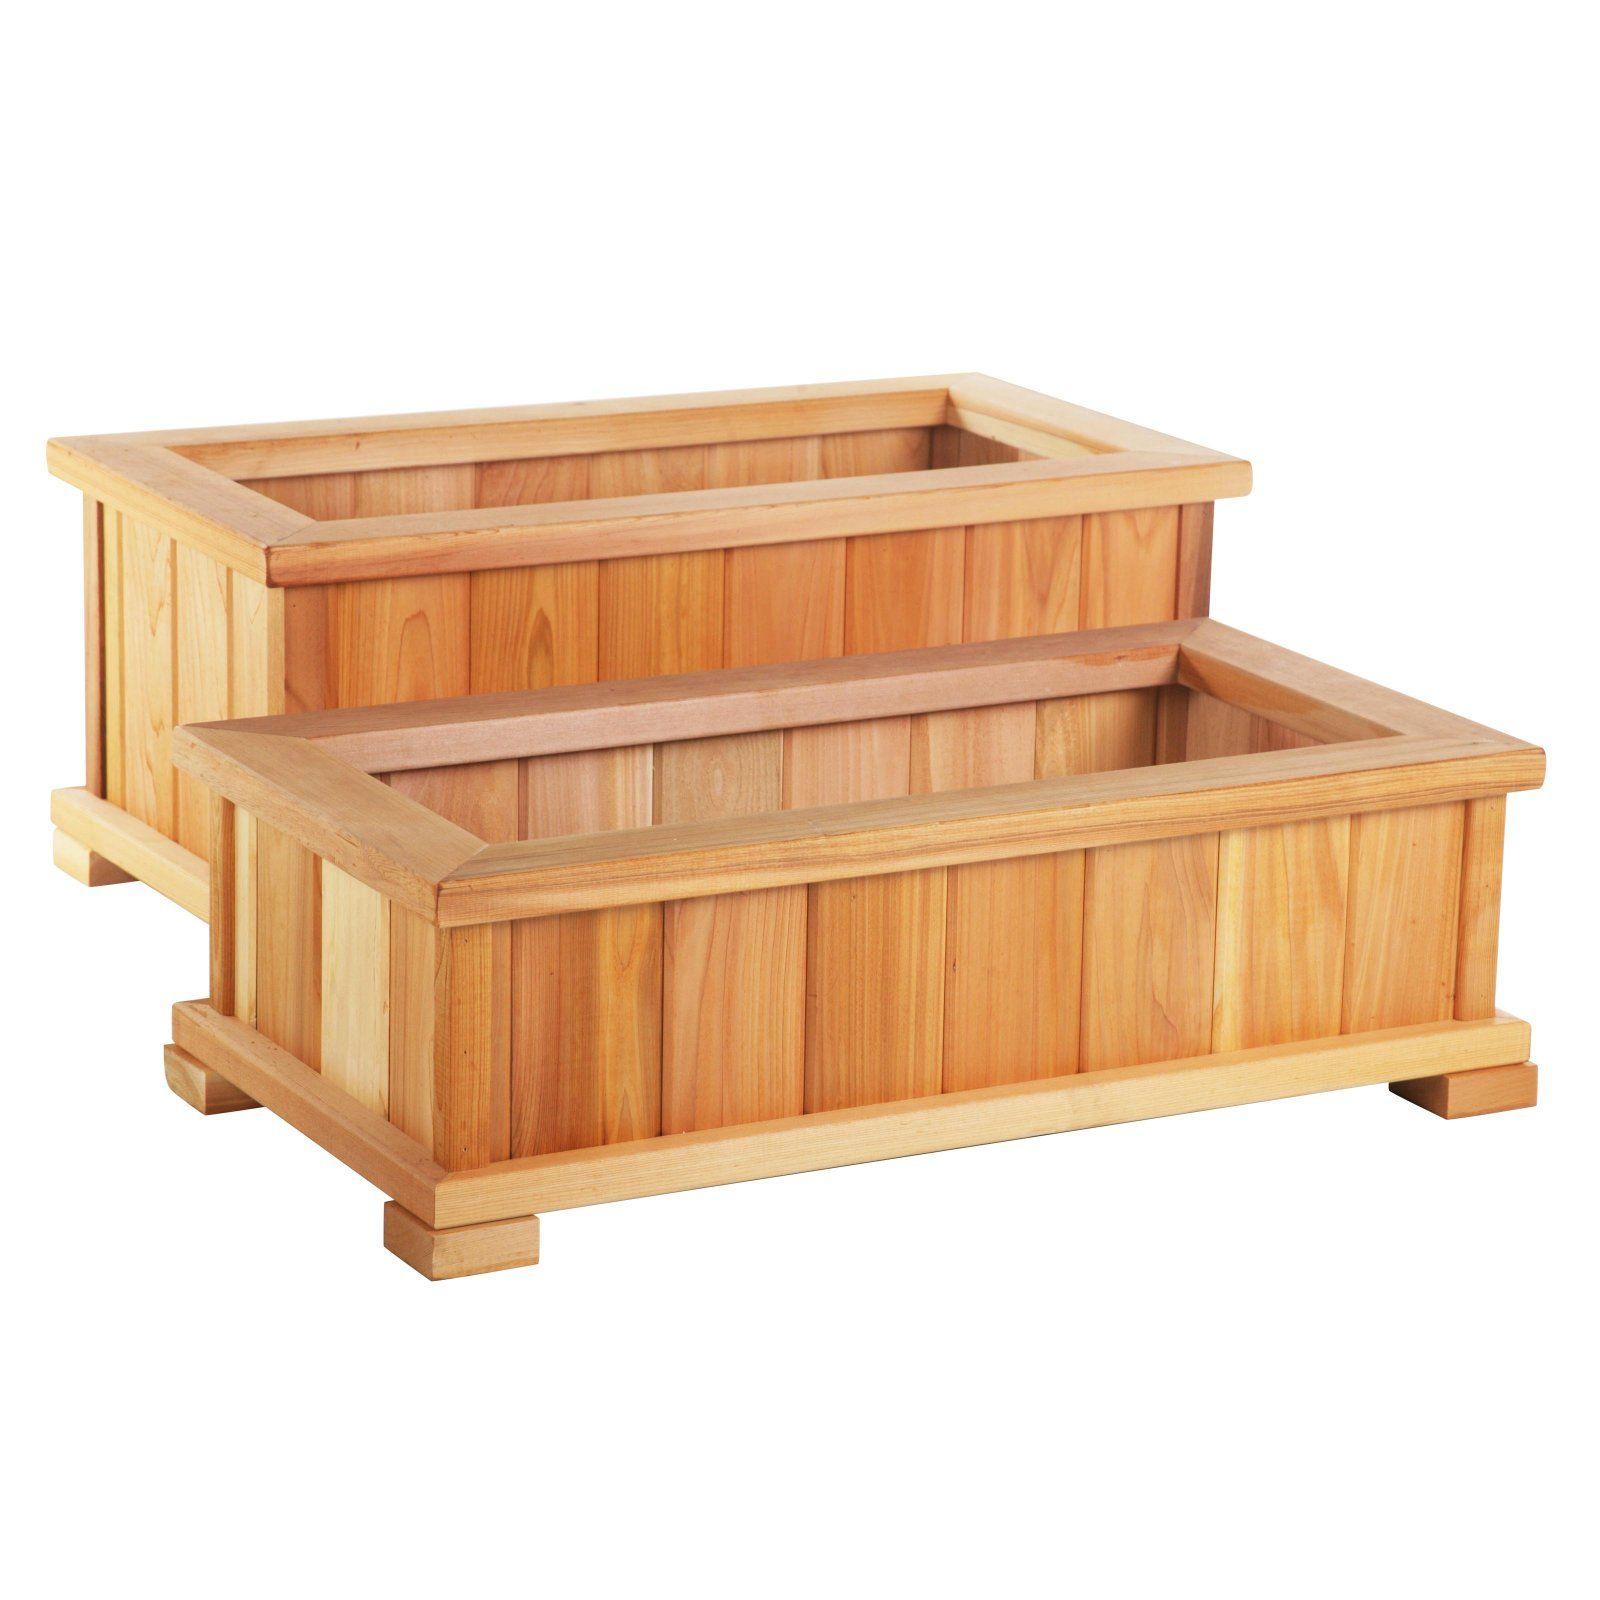 wooden planter box [ 1600 x 1600 Pixel ]